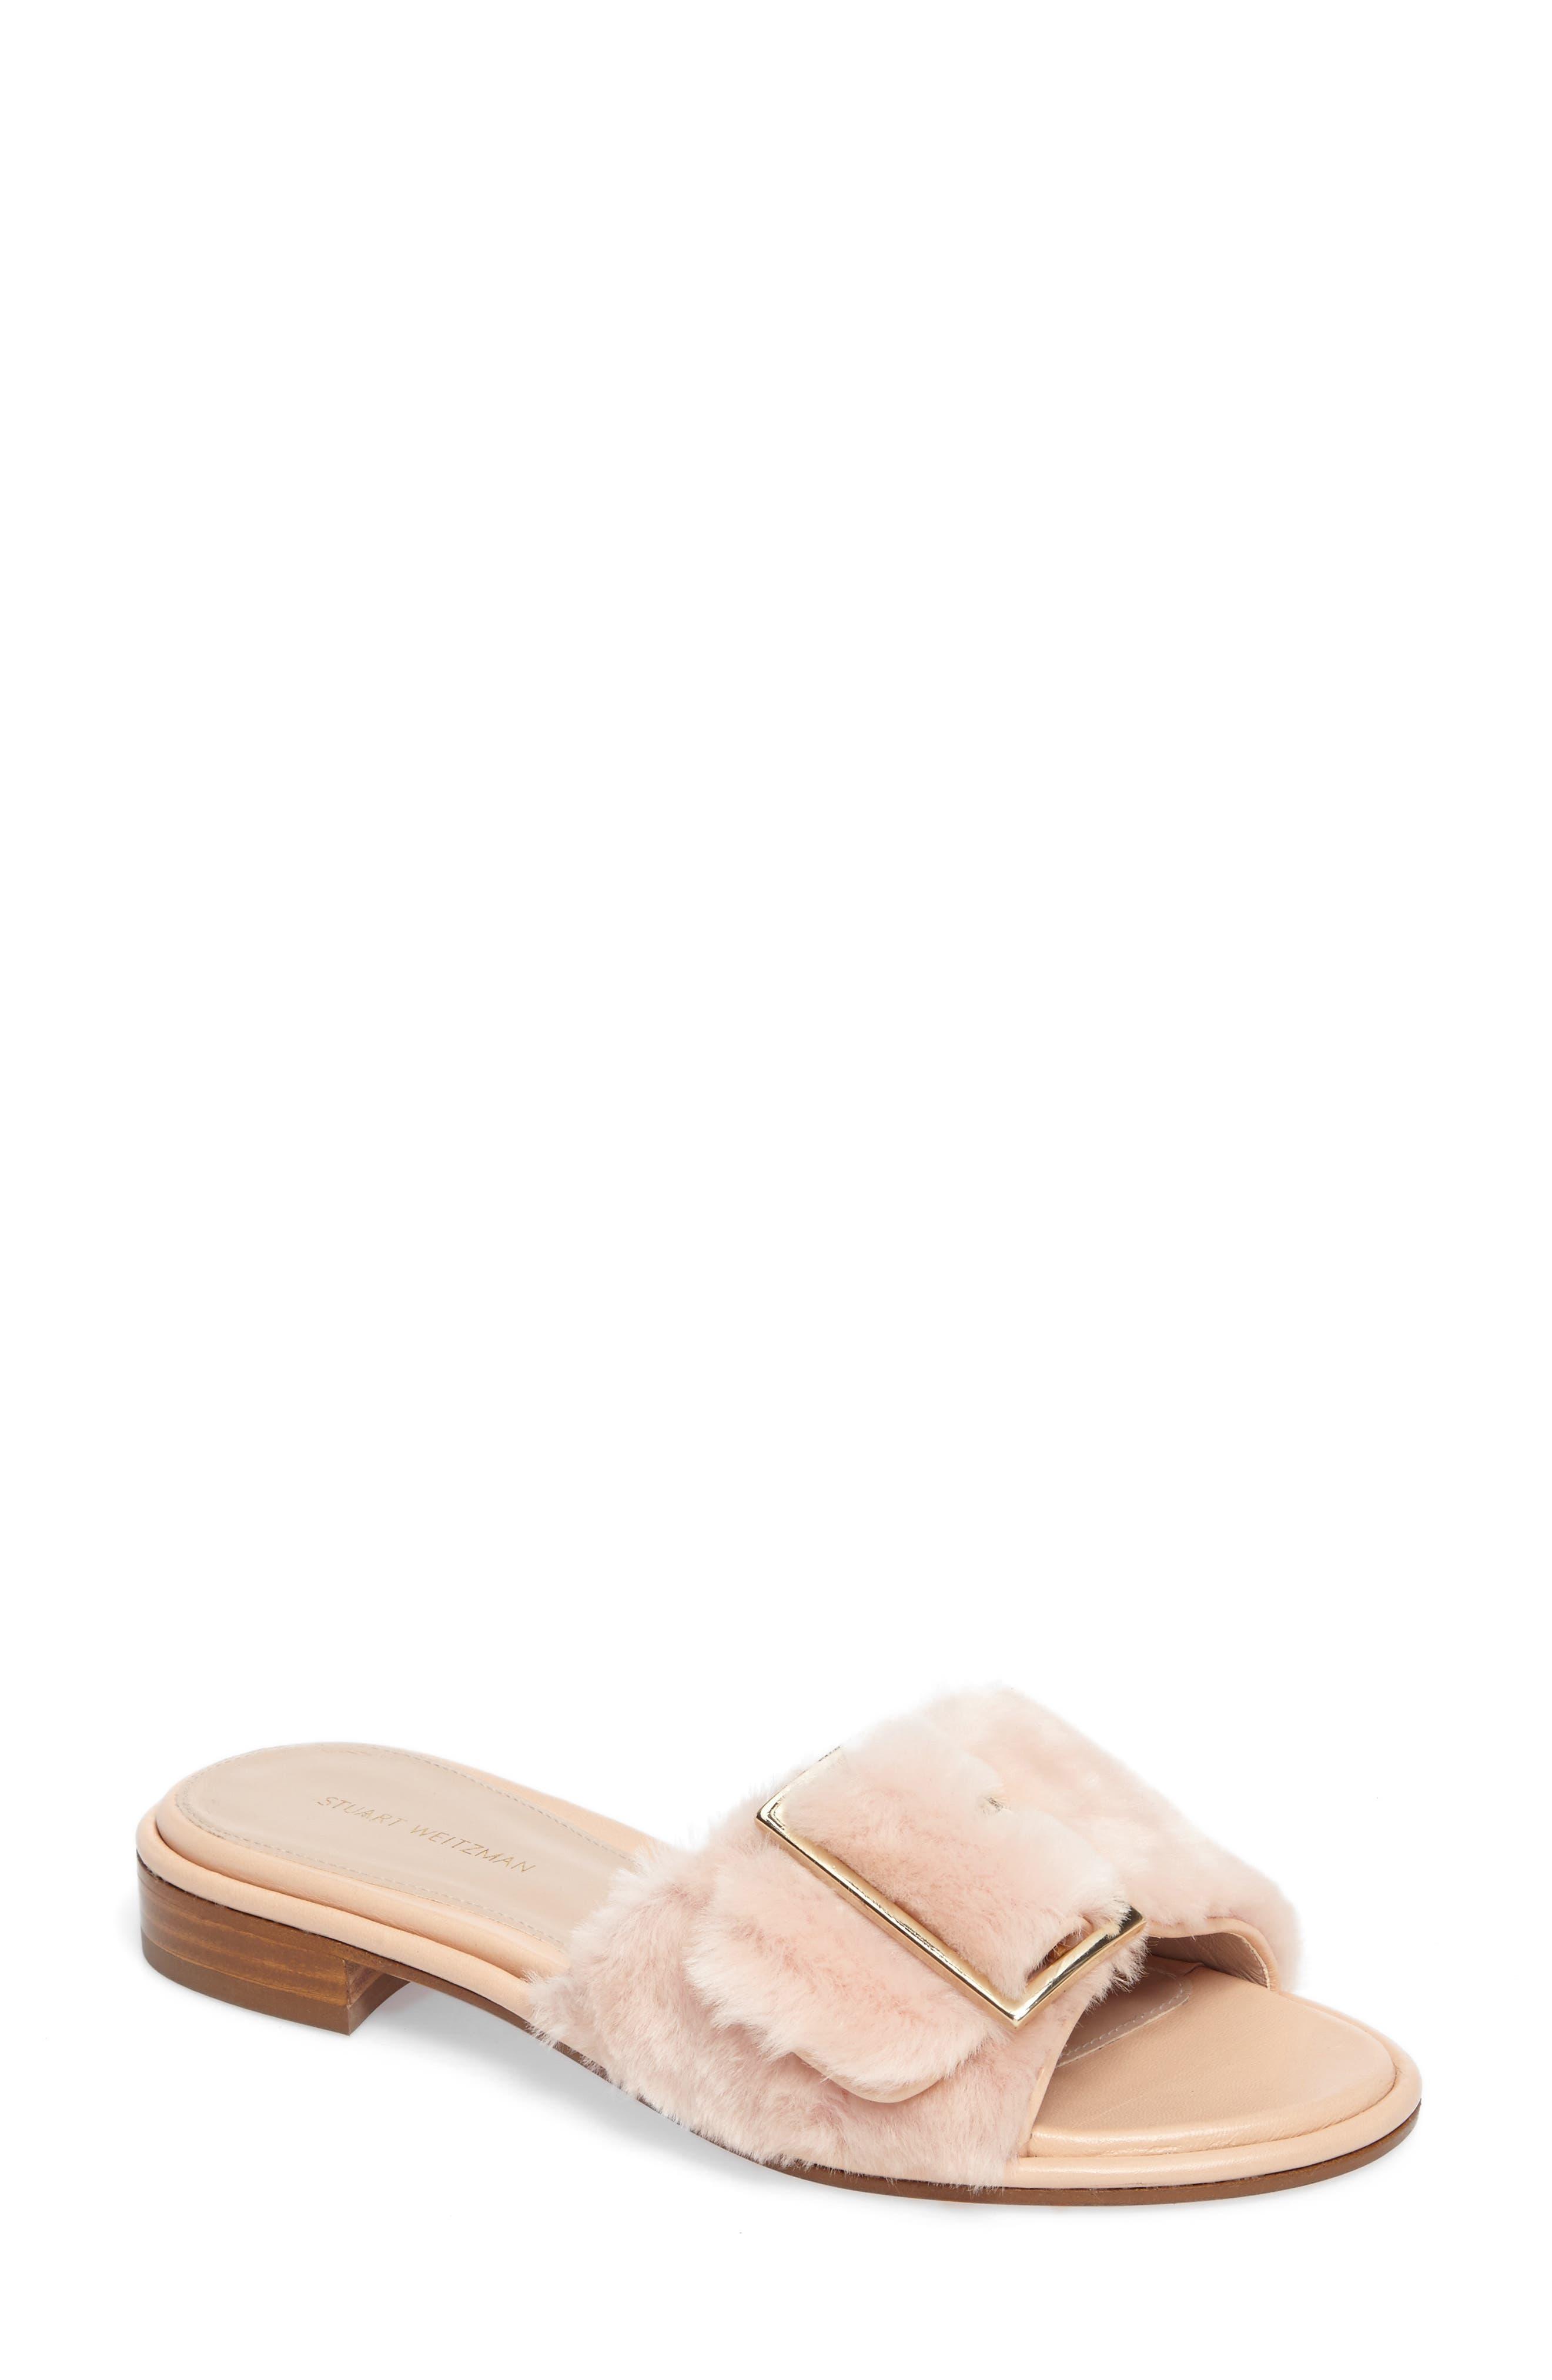 Fuzzywuz Genuine Shearling Slide Sandal,                         Main,                         color, 270